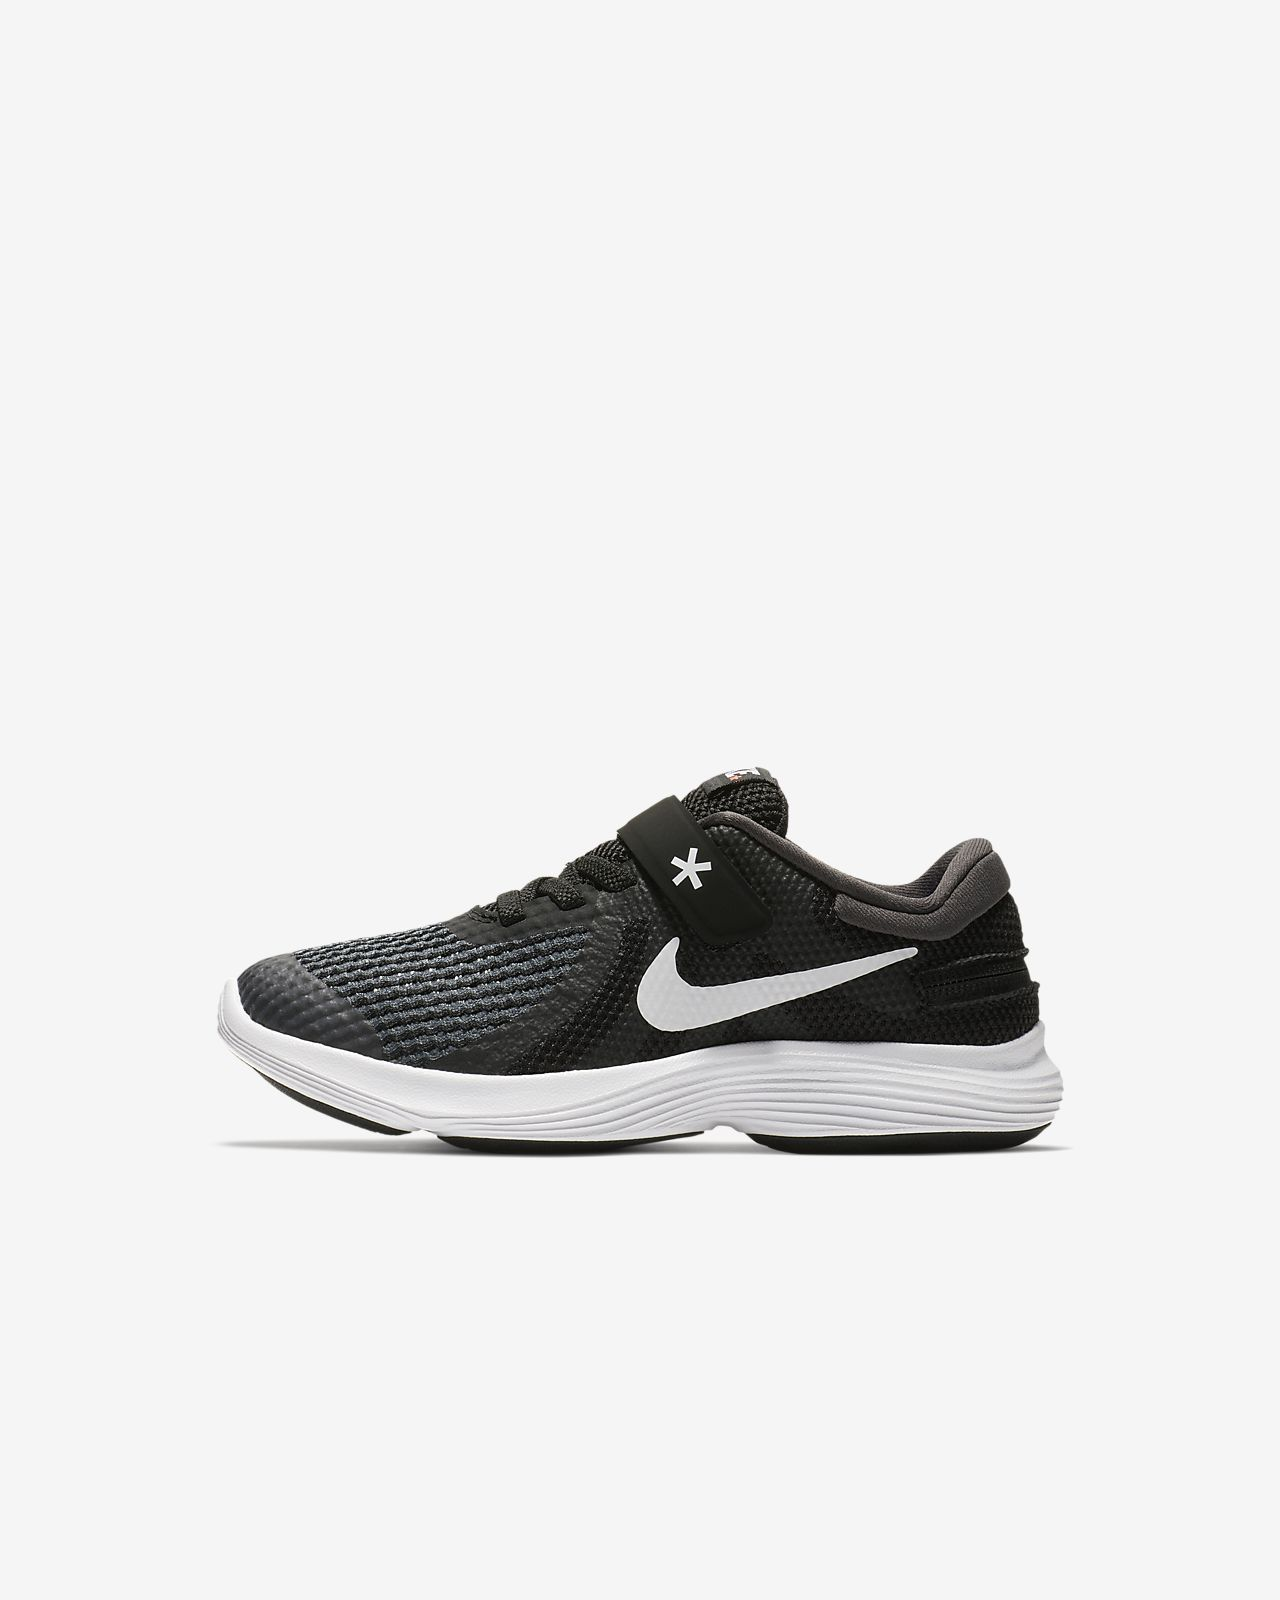 b71efcc083b60 Nike Revolution 4 FlyEase Zapatillas - Niño a pequeño a. Nike.com ES